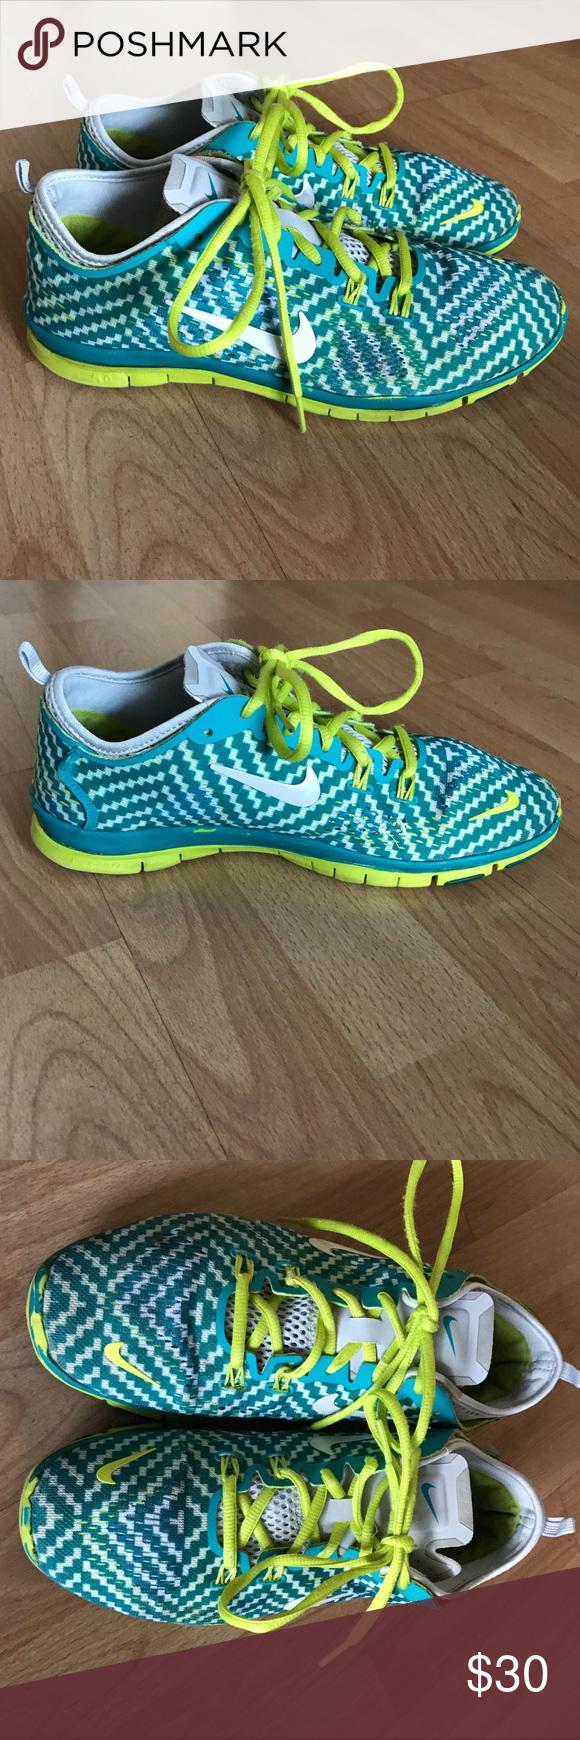 abae16a776db5 Women Nike Free 5.0 size 9 Women s Nike Free 5.0 Runs Nike Shoes Athletic  Shoes